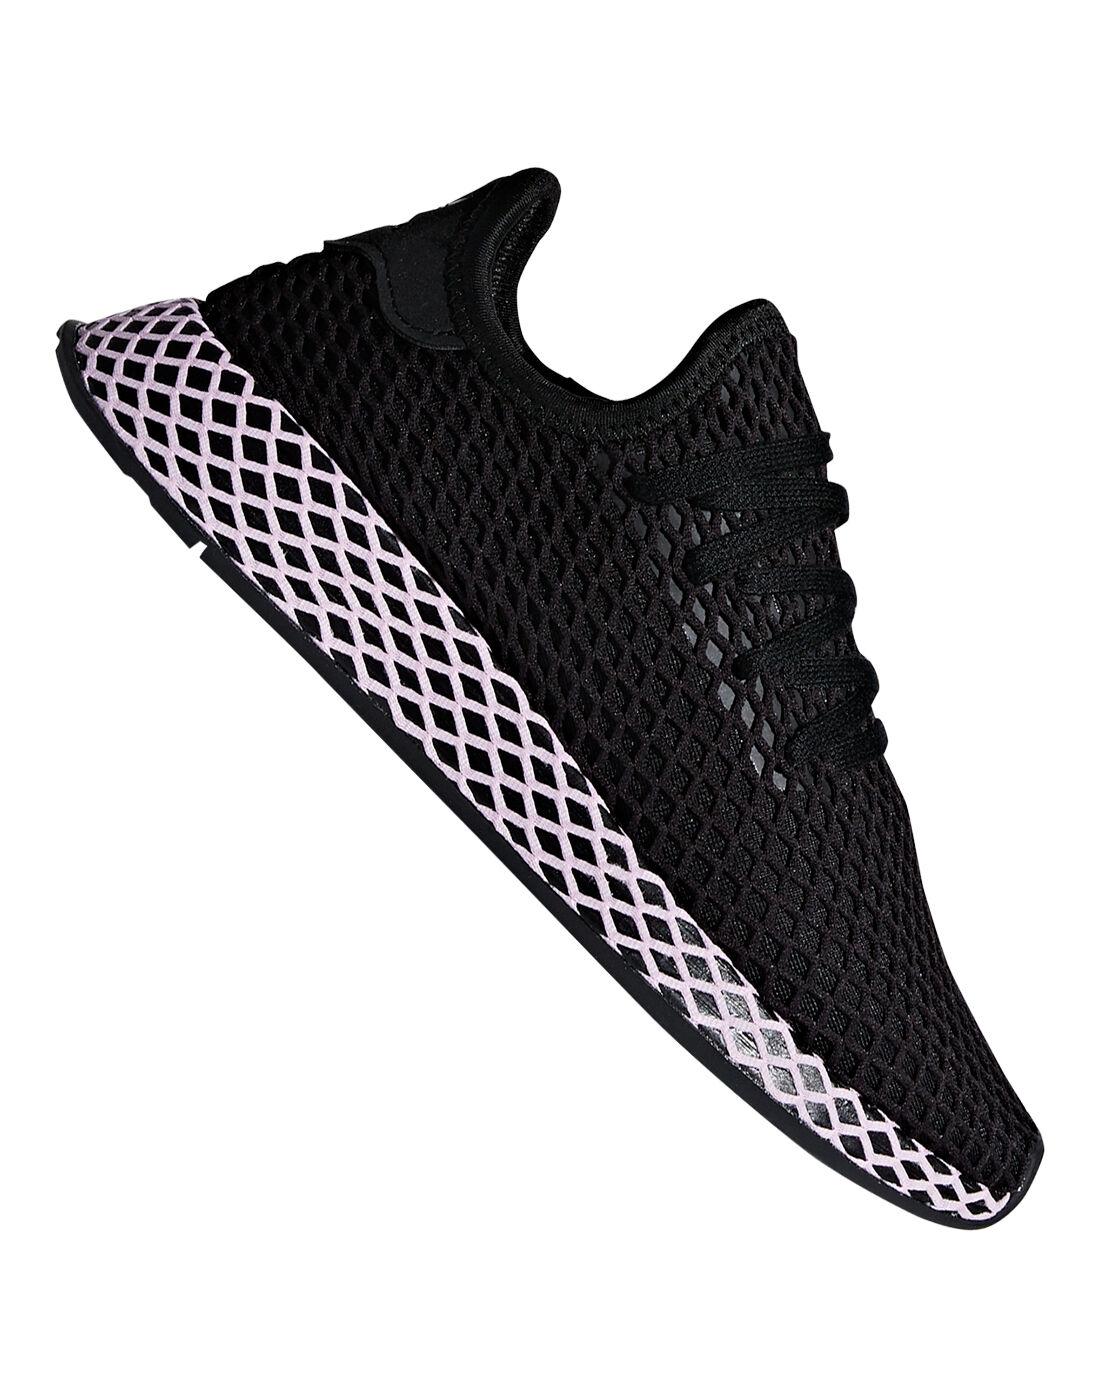 adidas Originals Deerupt | Black